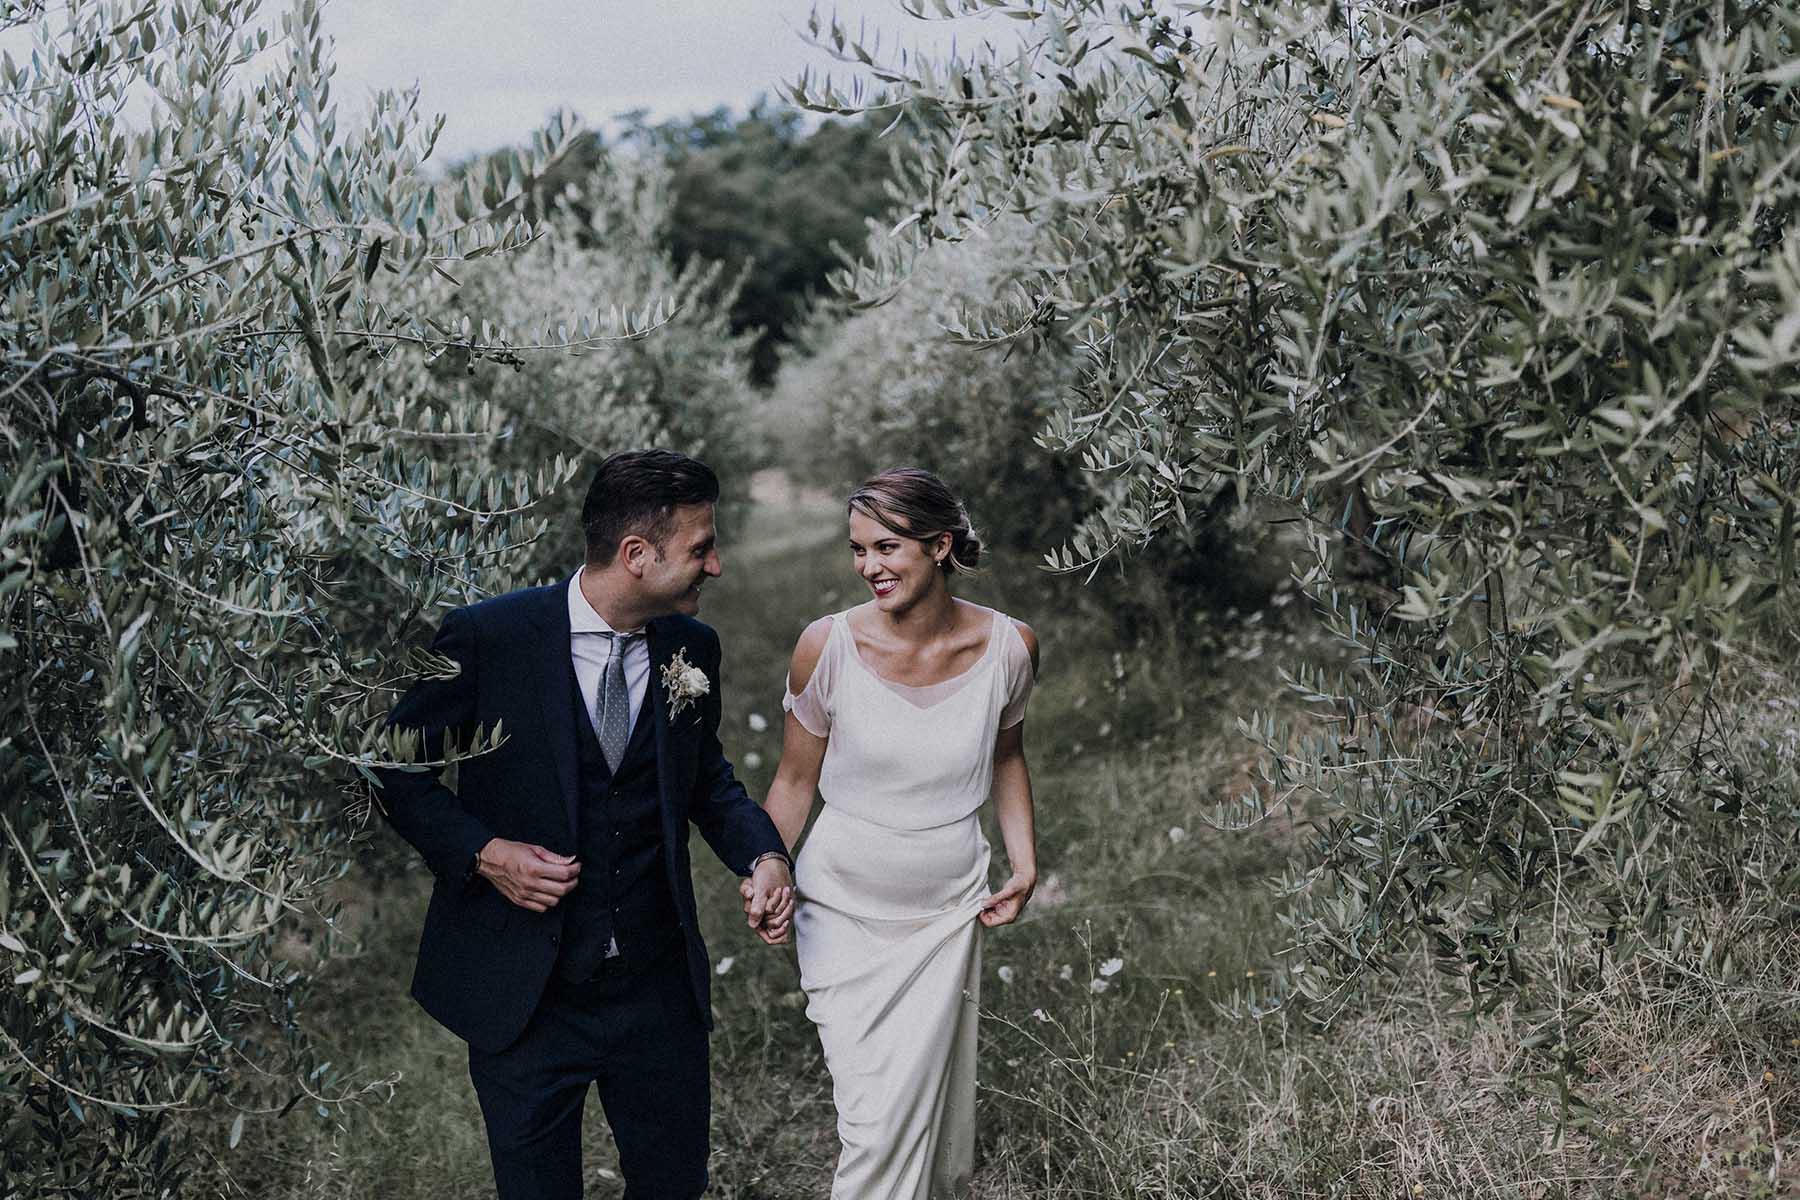 wedding rosciano castle italy 110.jpg